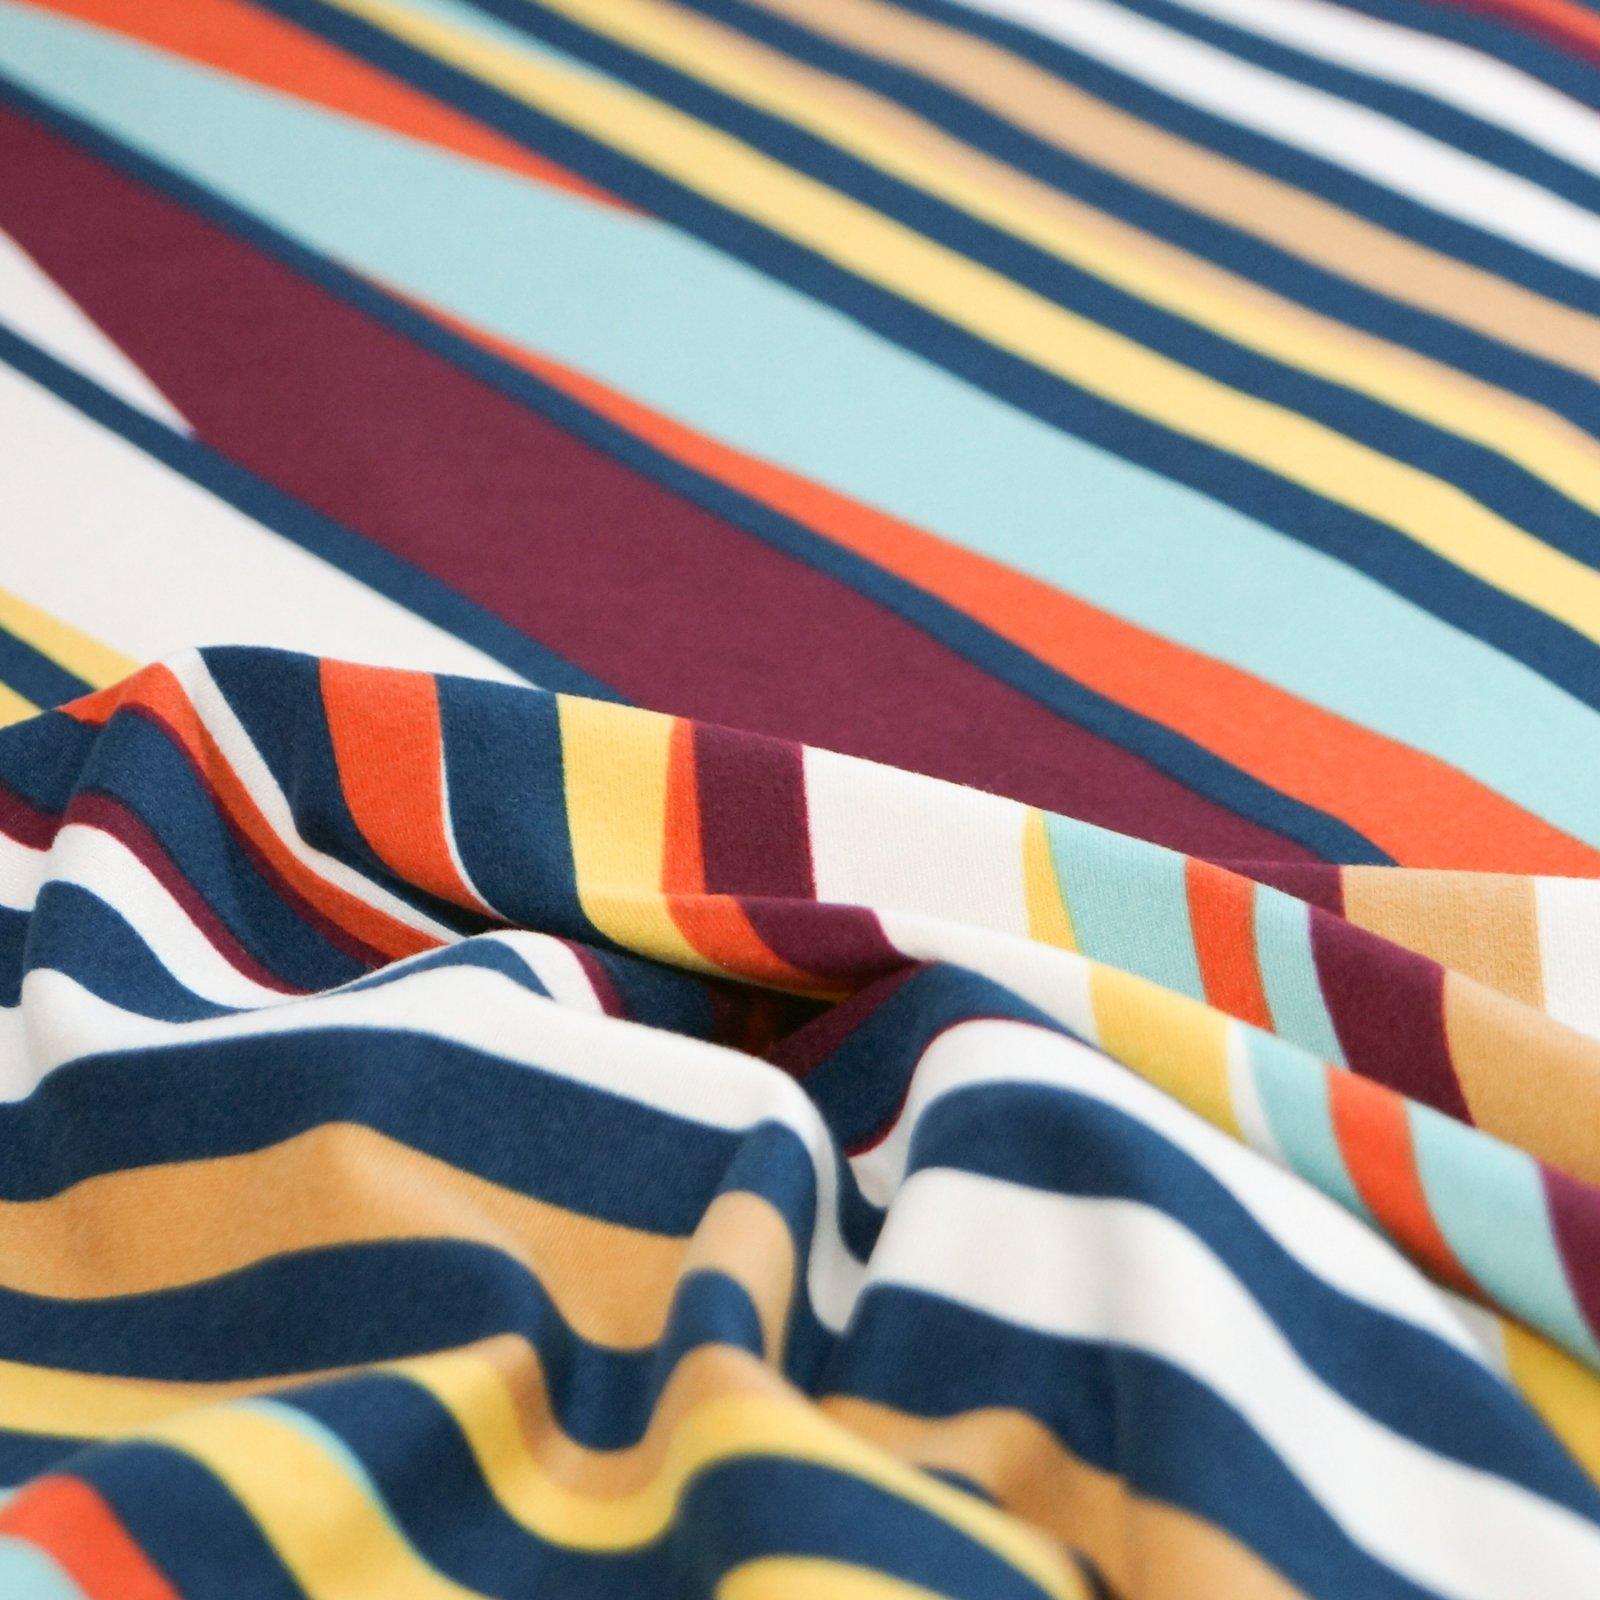 Knit - Stripes: Asymmetrical Sunset Colors